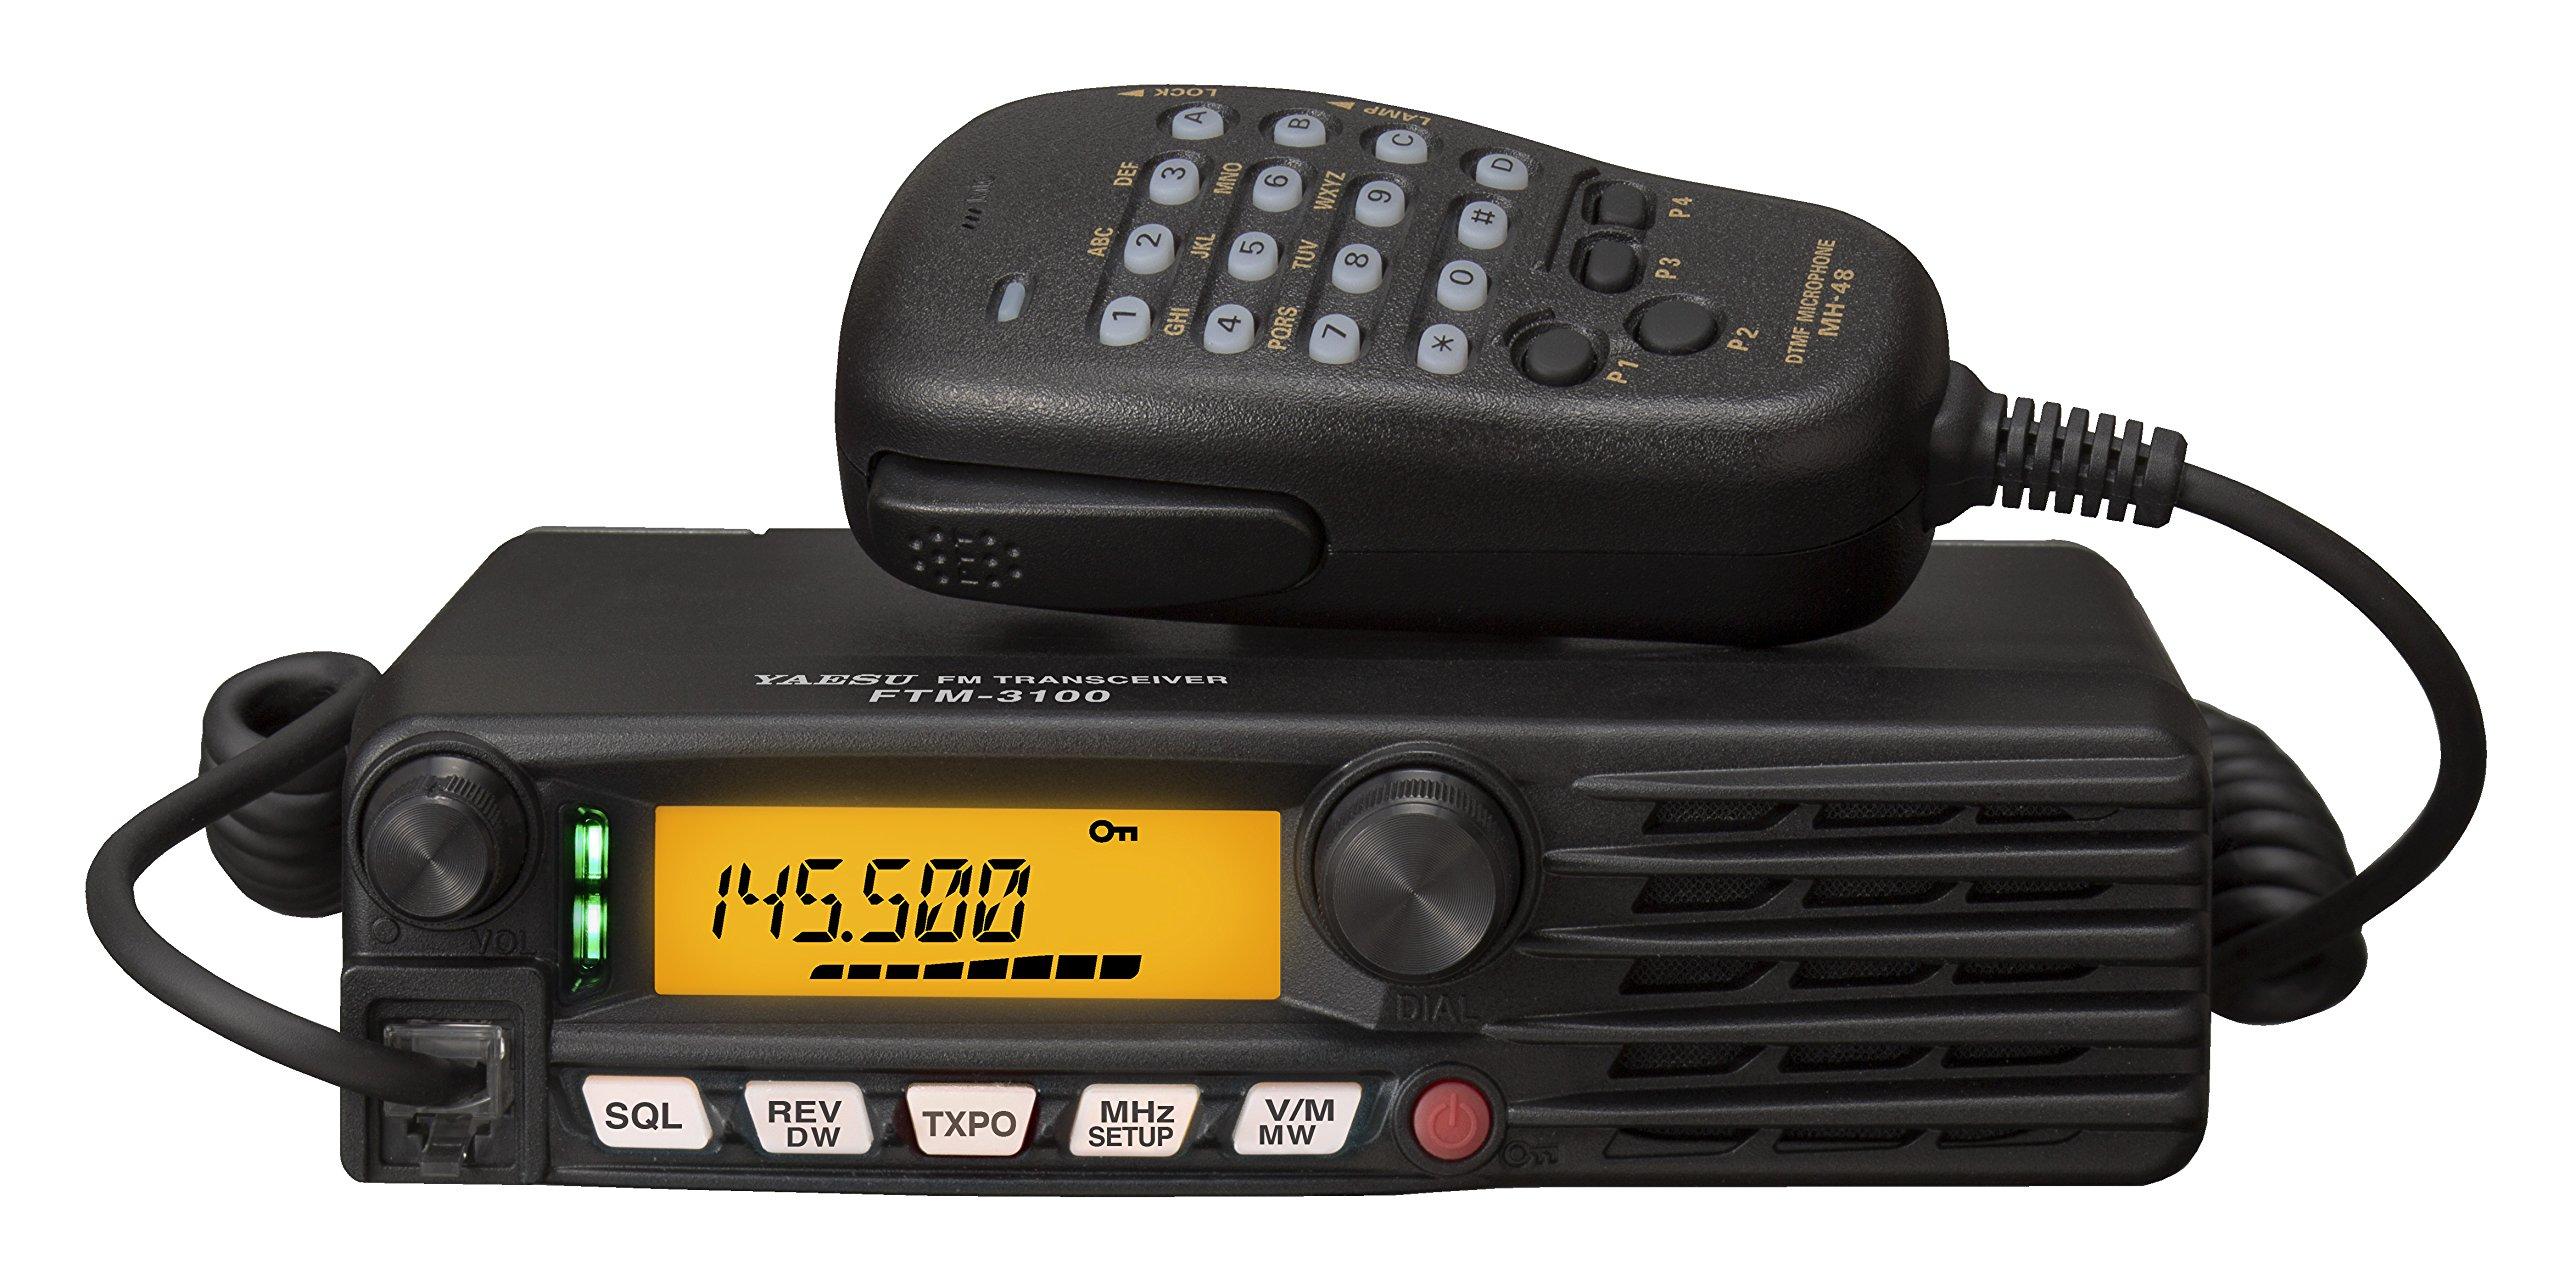 Yaesu Original FTM-3100R 144 MHz Analog Single Band Rugged 65W Mobile Transceiver - 3 Year Manufacturer Warranty by Yaesu